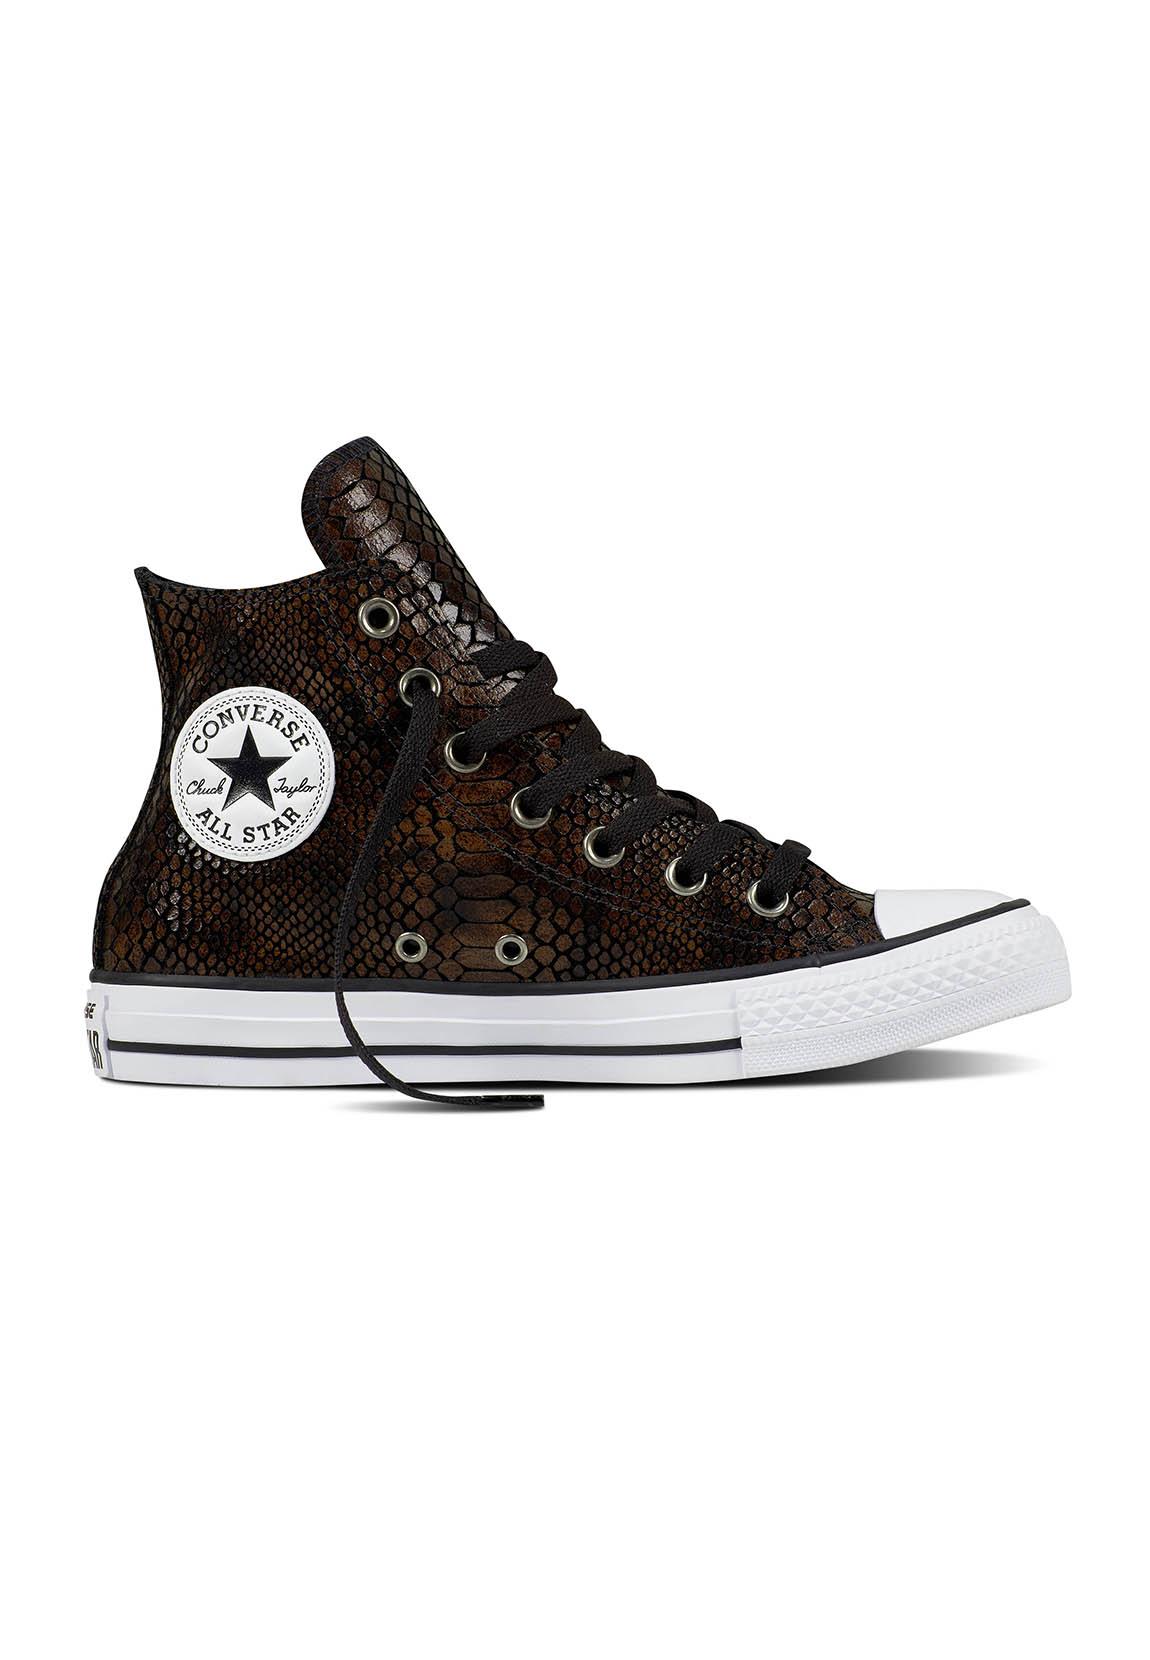 converse chucks high ct as hi 557919c braun schwarz brown black schuhe damen. Black Bedroom Furniture Sets. Home Design Ideas